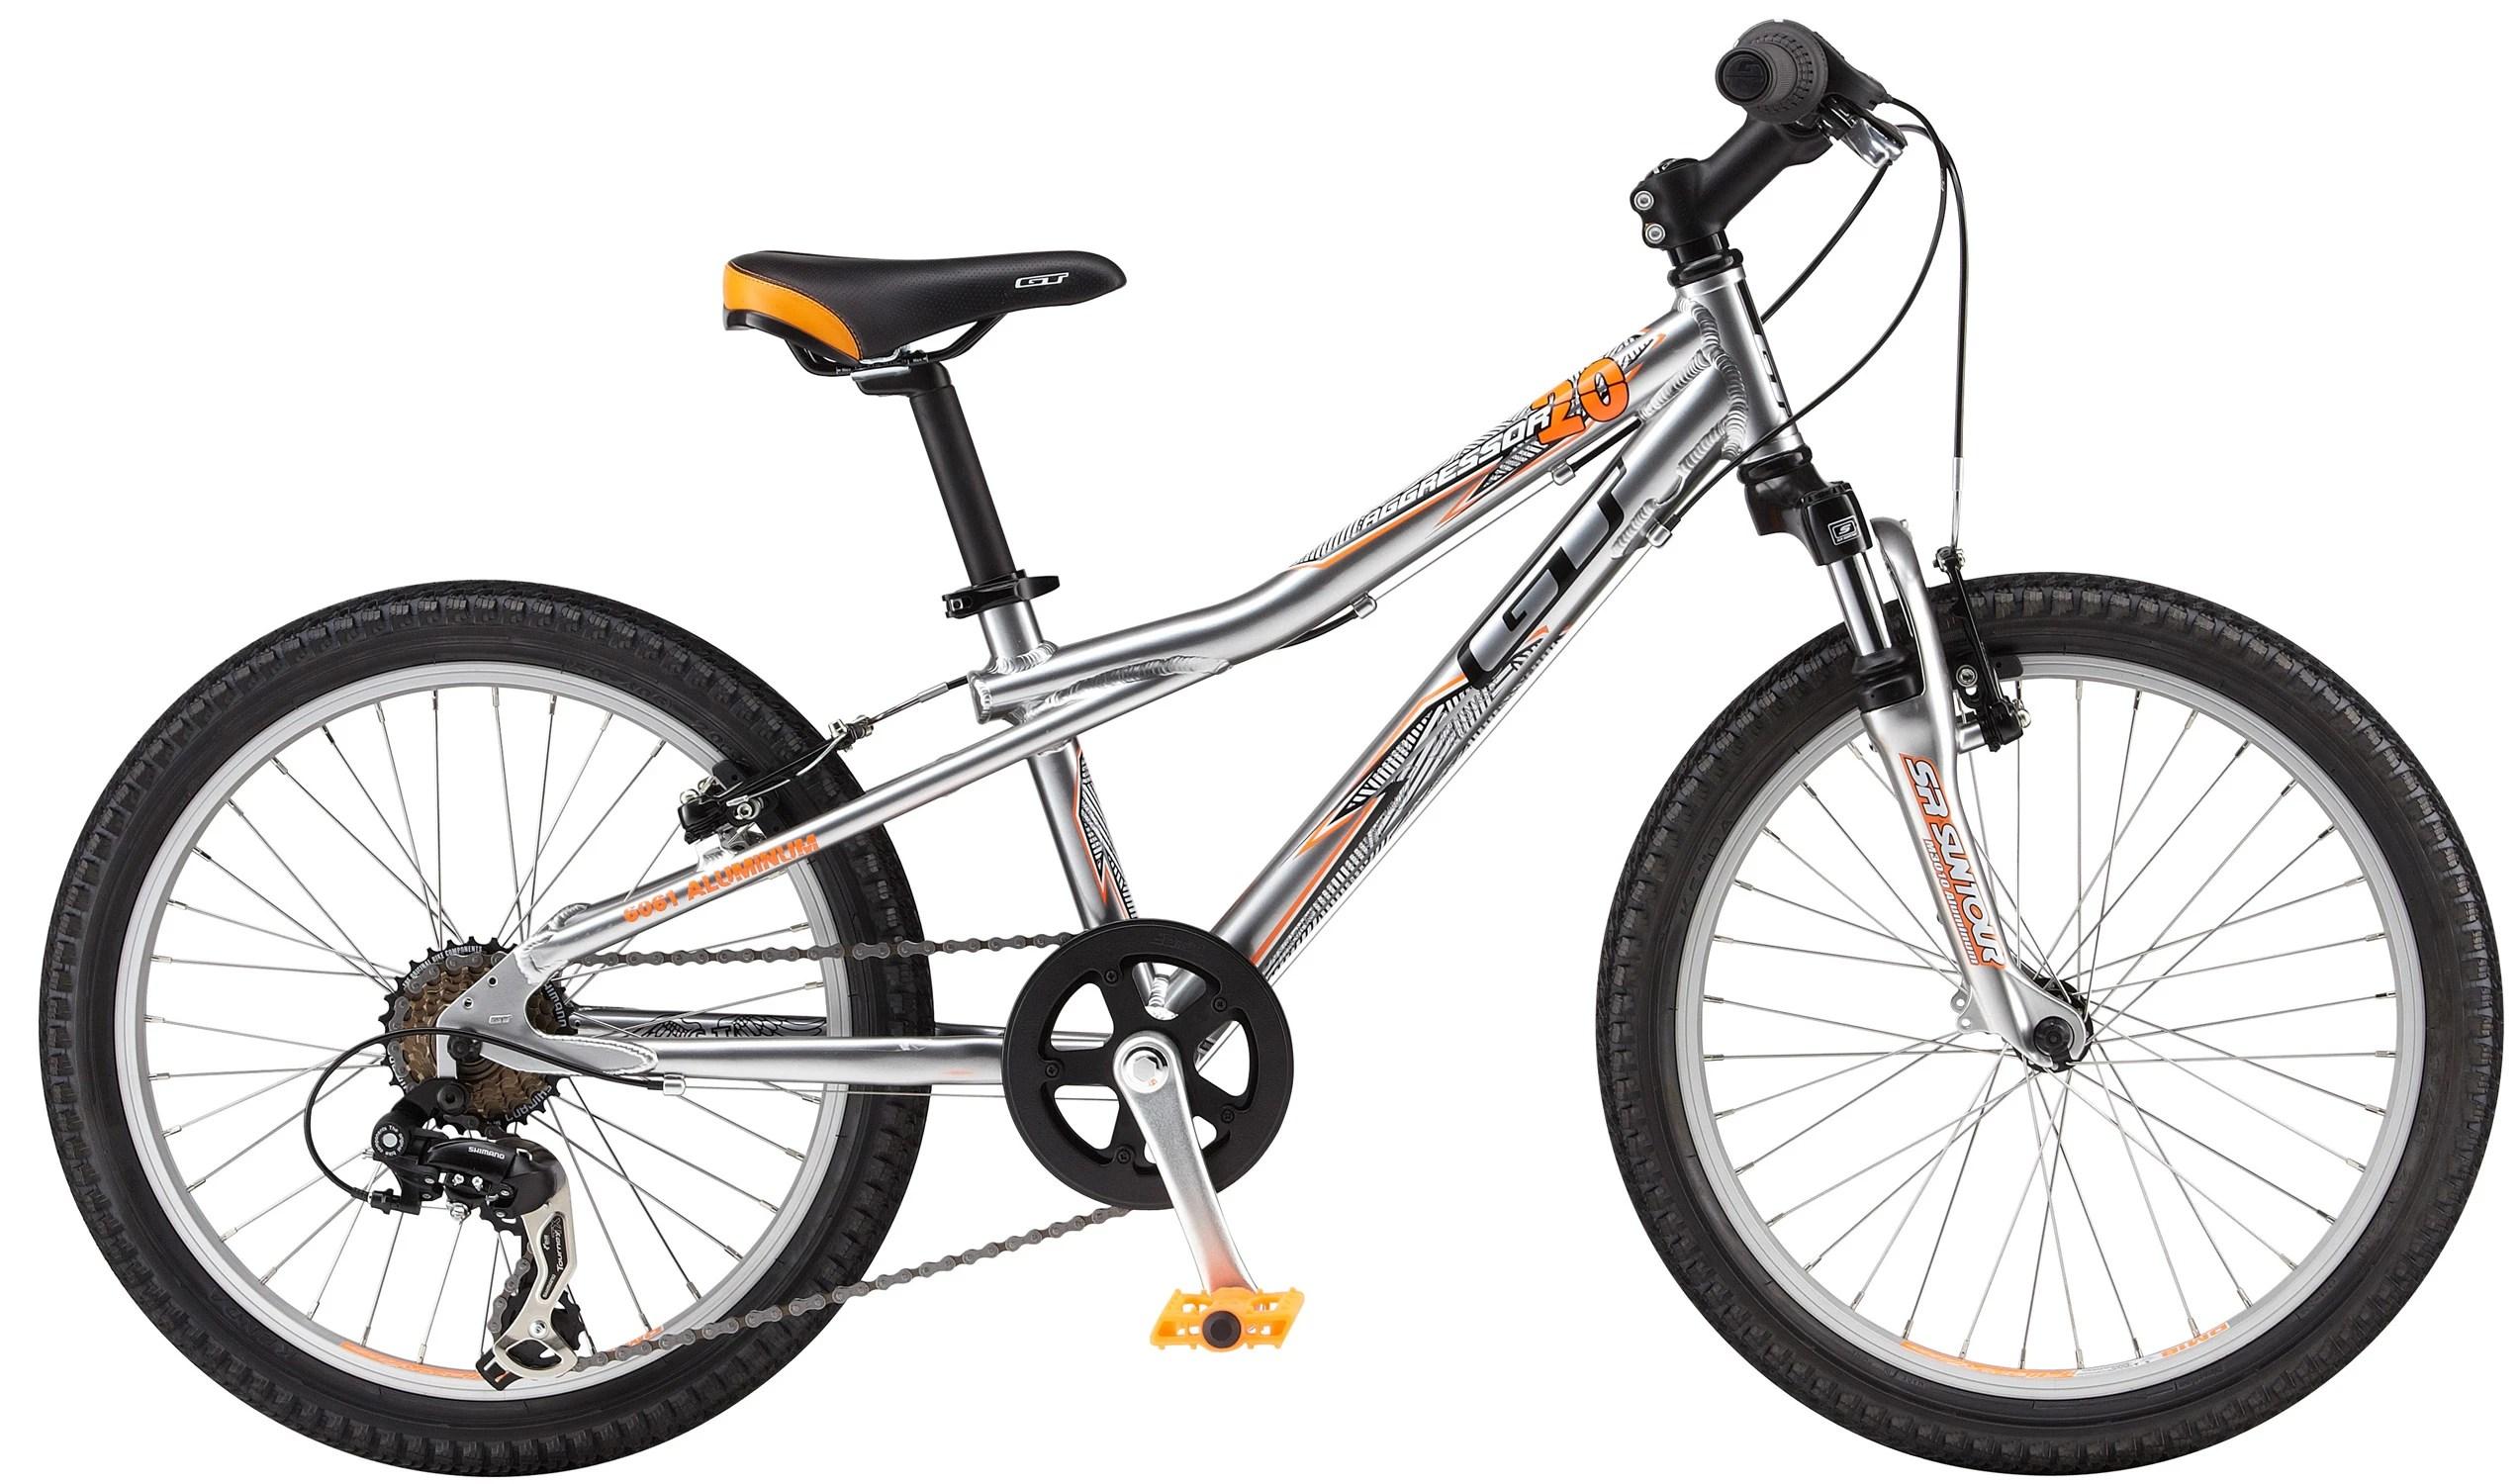 Gt Aggressor 20 Bike